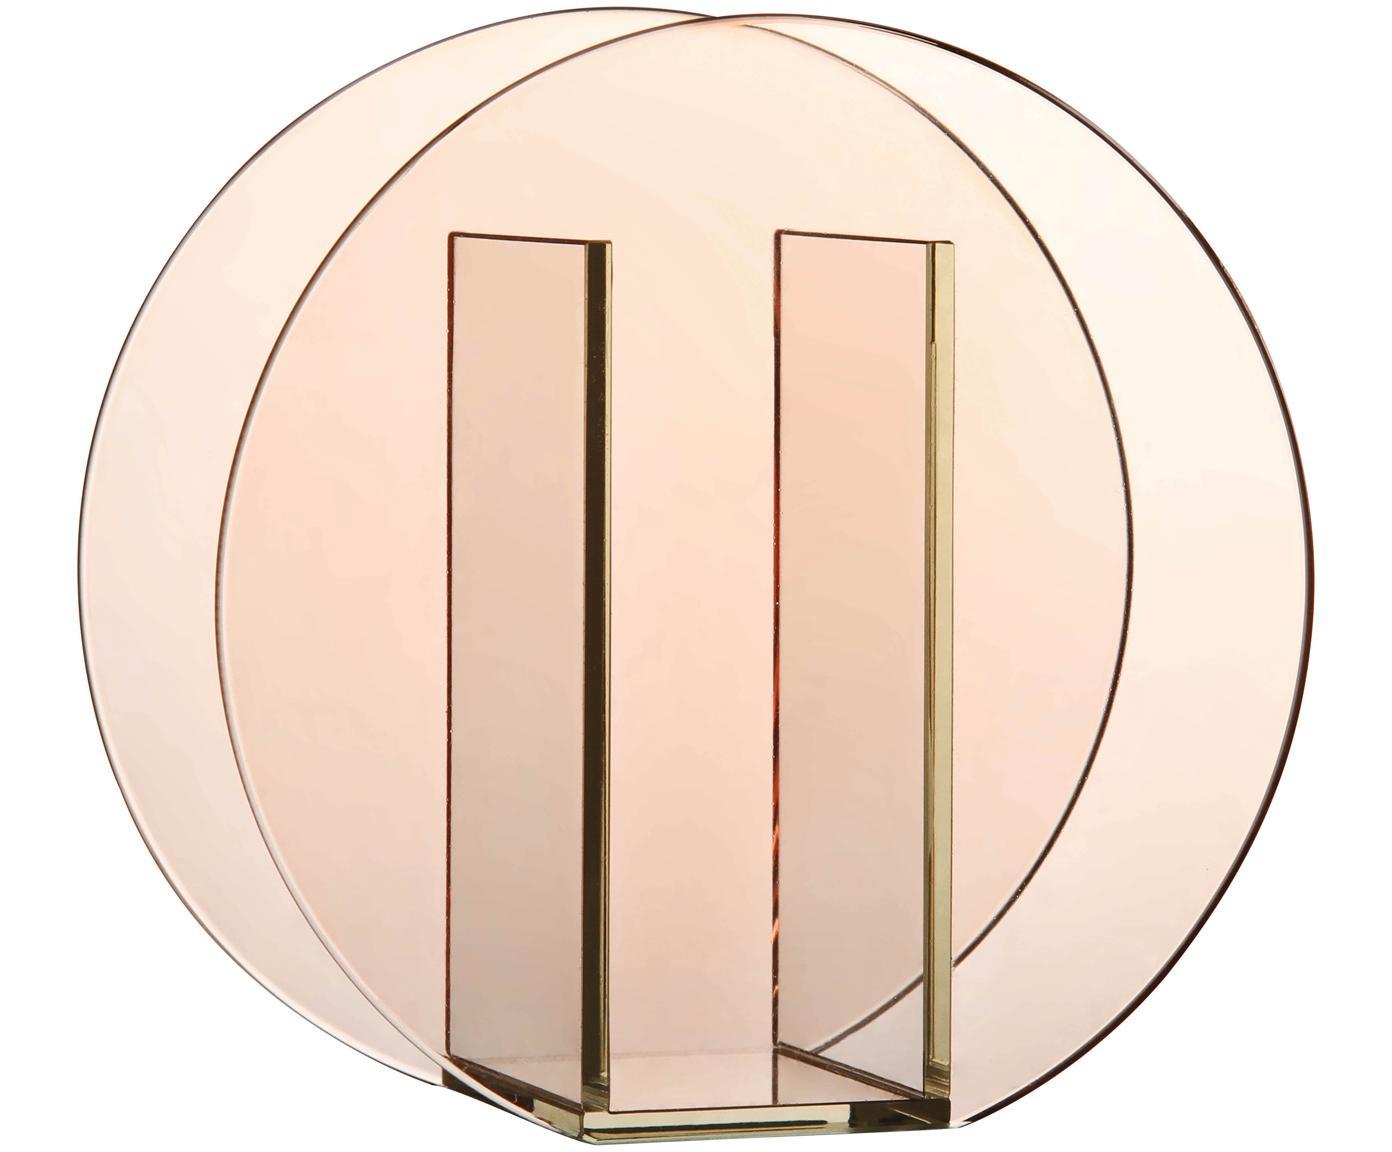 Jarrón de vidrio Transparence, Vidrio, Rosa, An 17 x Al 17 cm